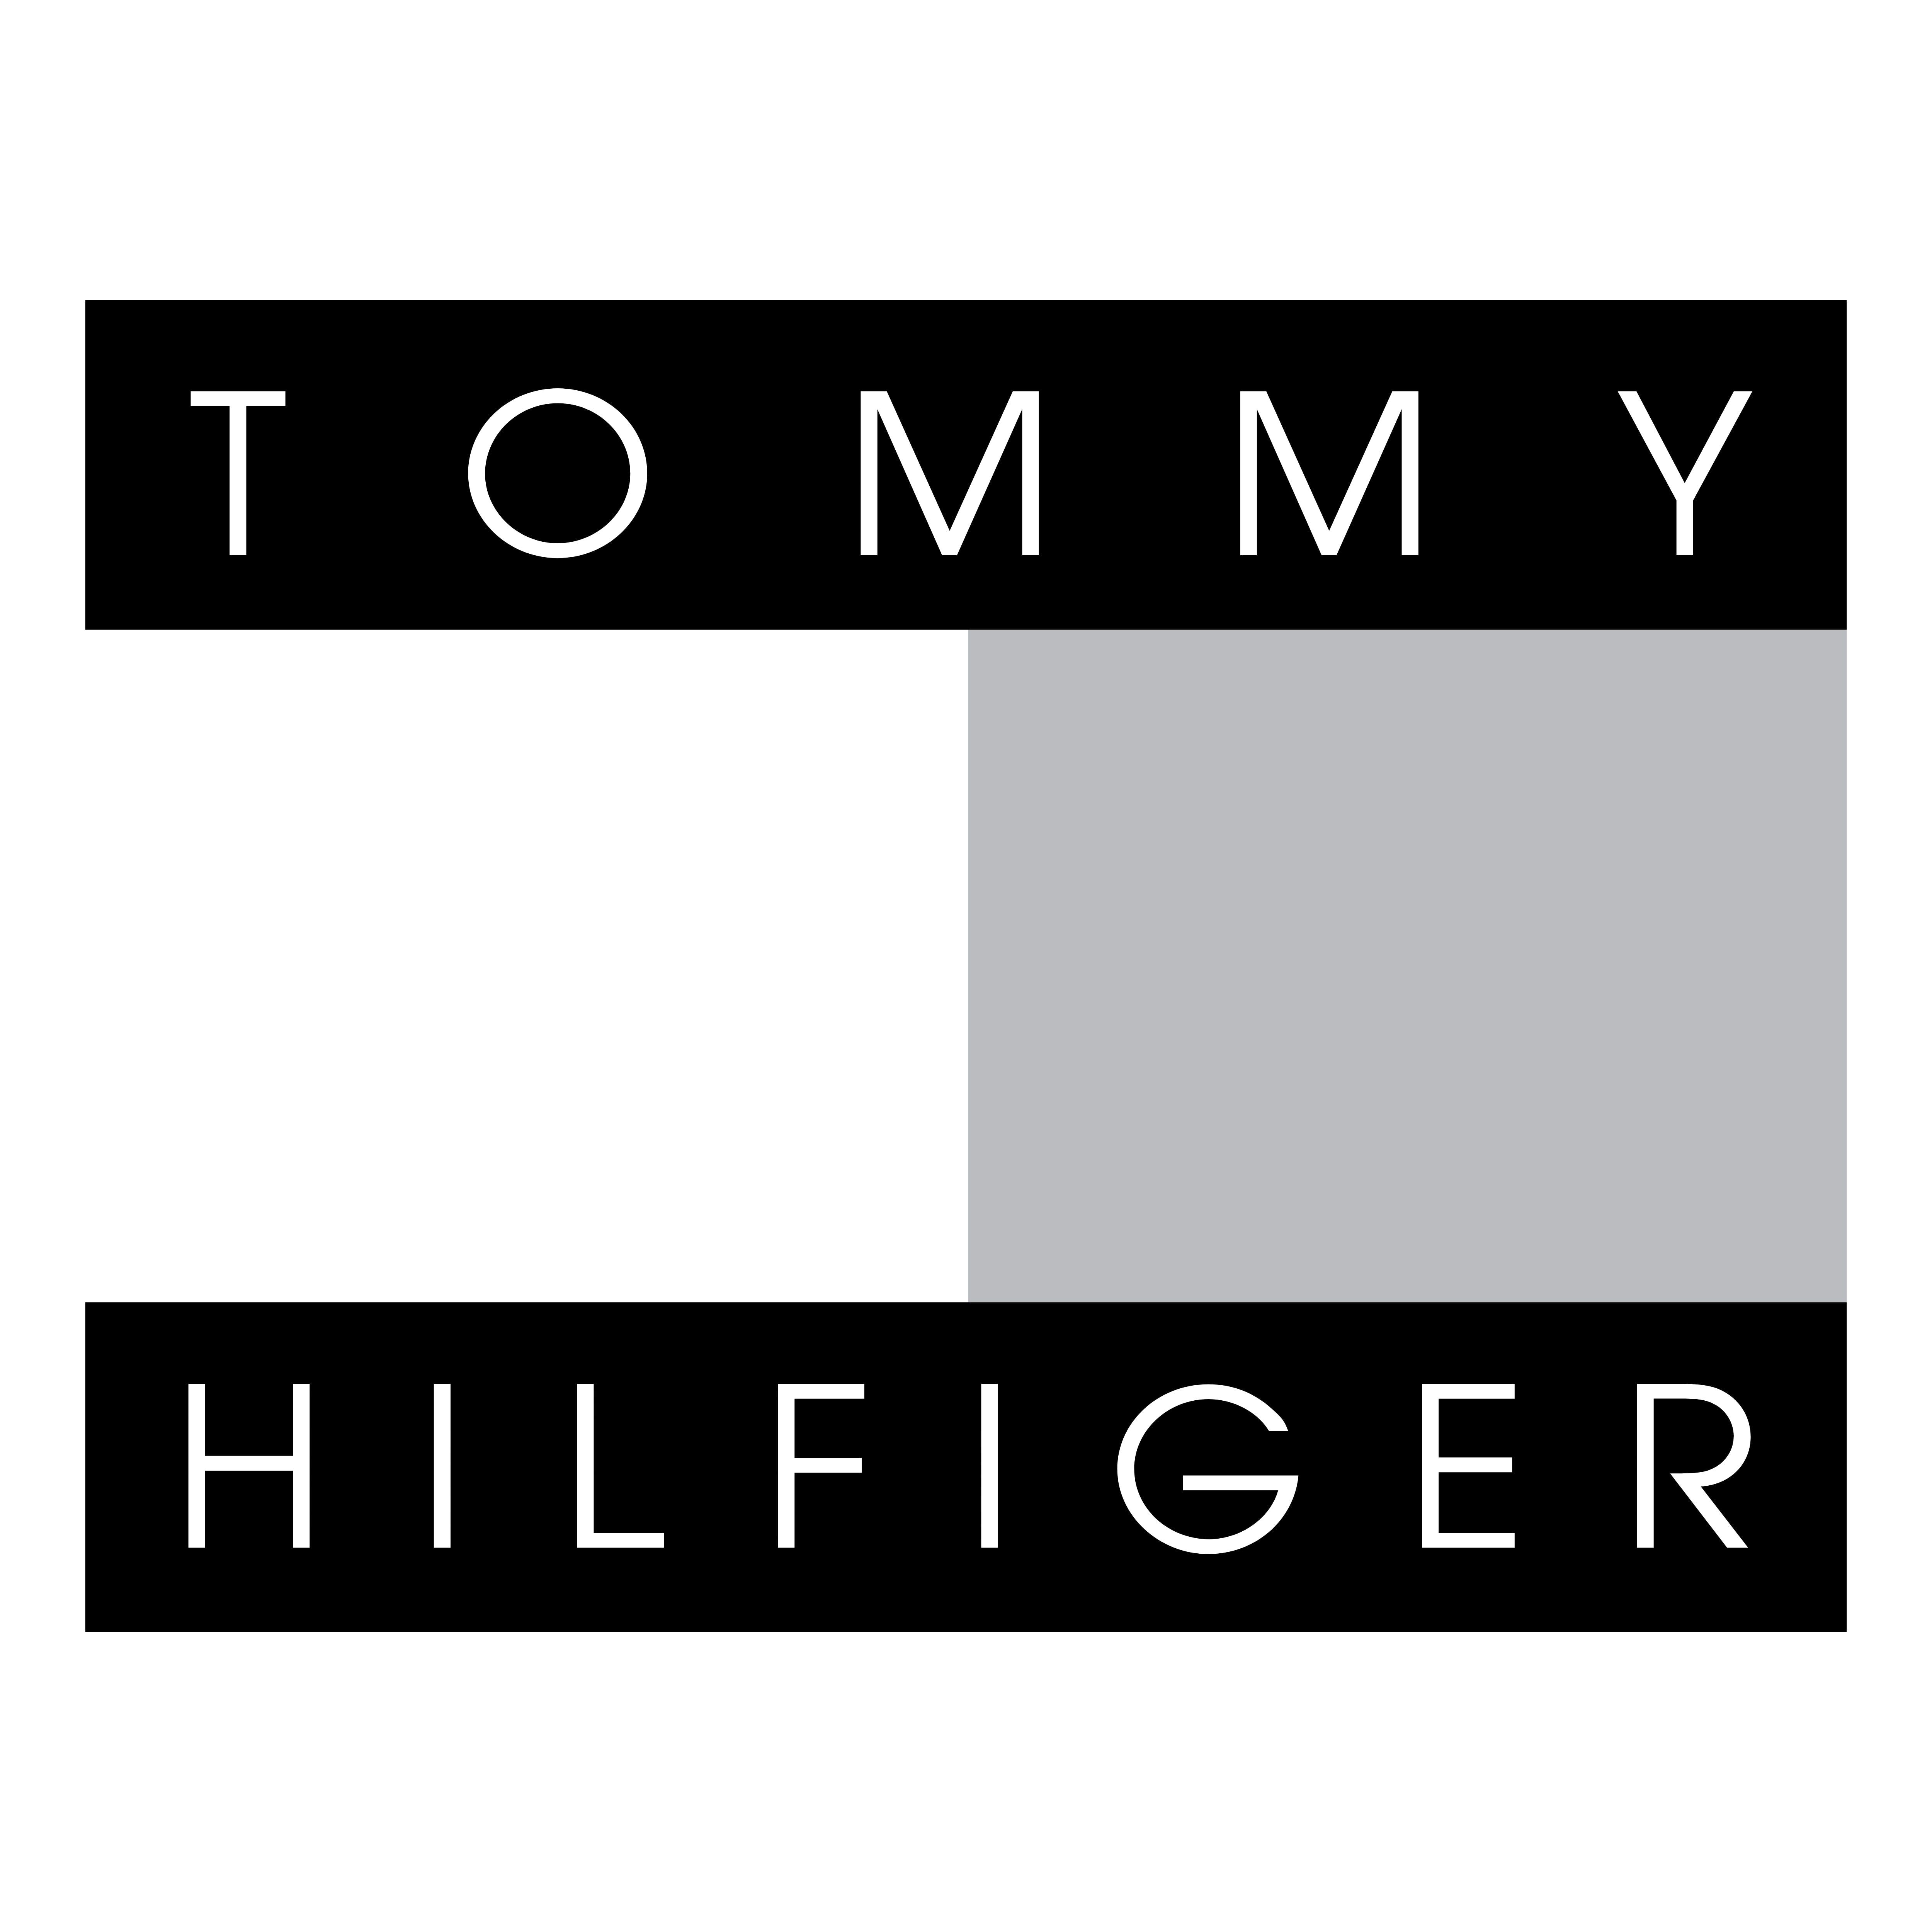 Tommy Hilfiger logo. Link to usa.tommy.com